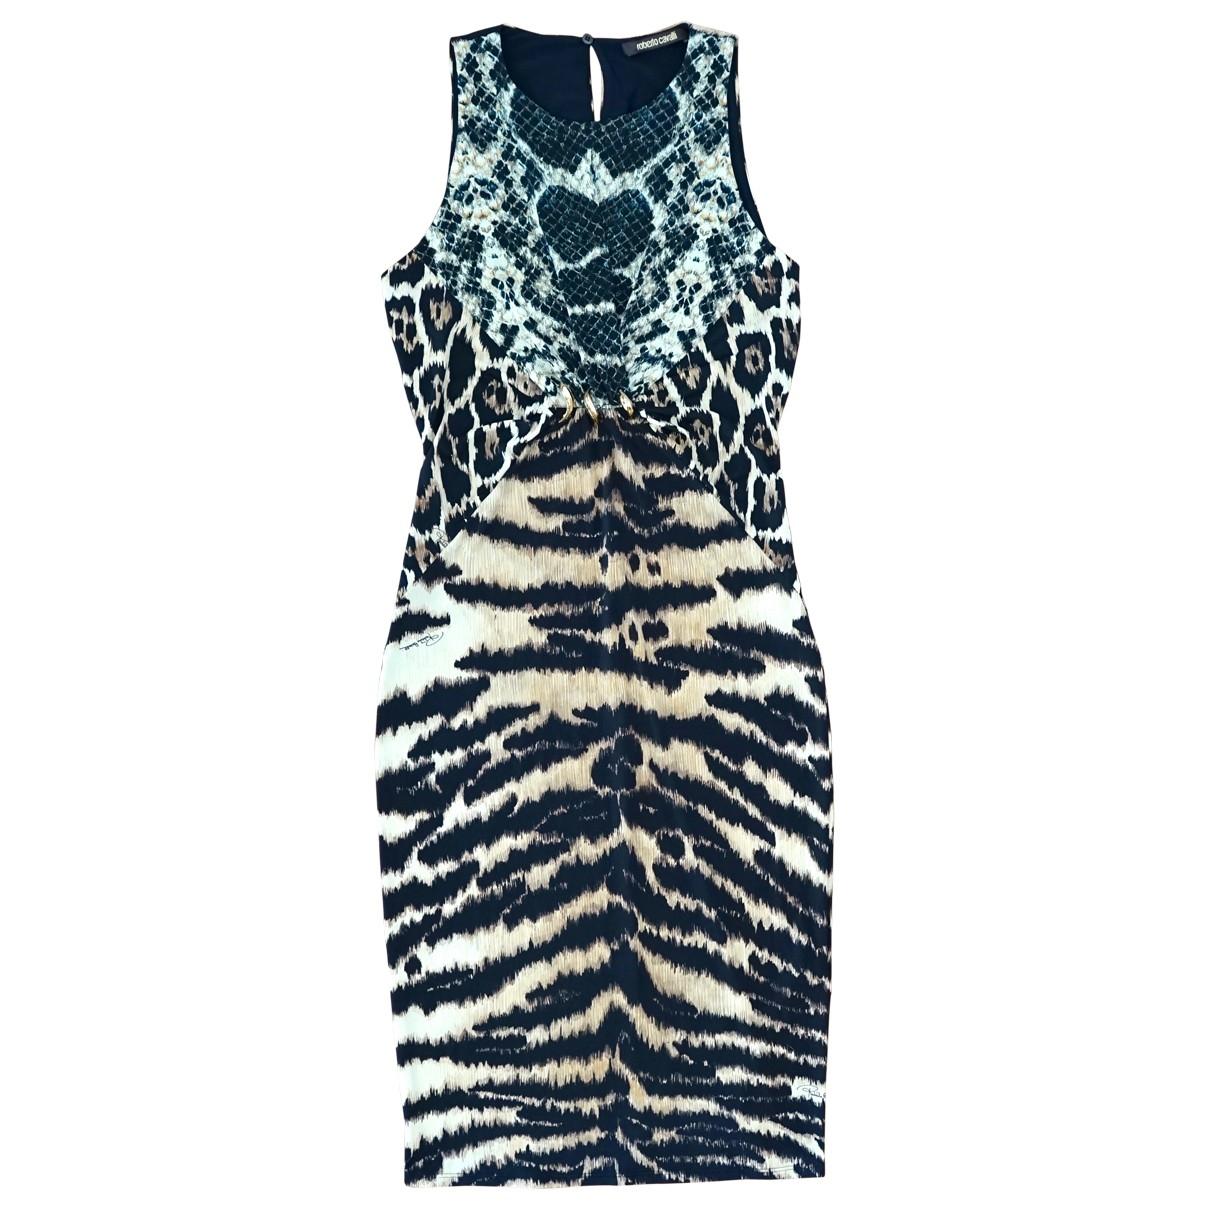 Roberto Cavalli \N Multicolour dress for Women 40 IT